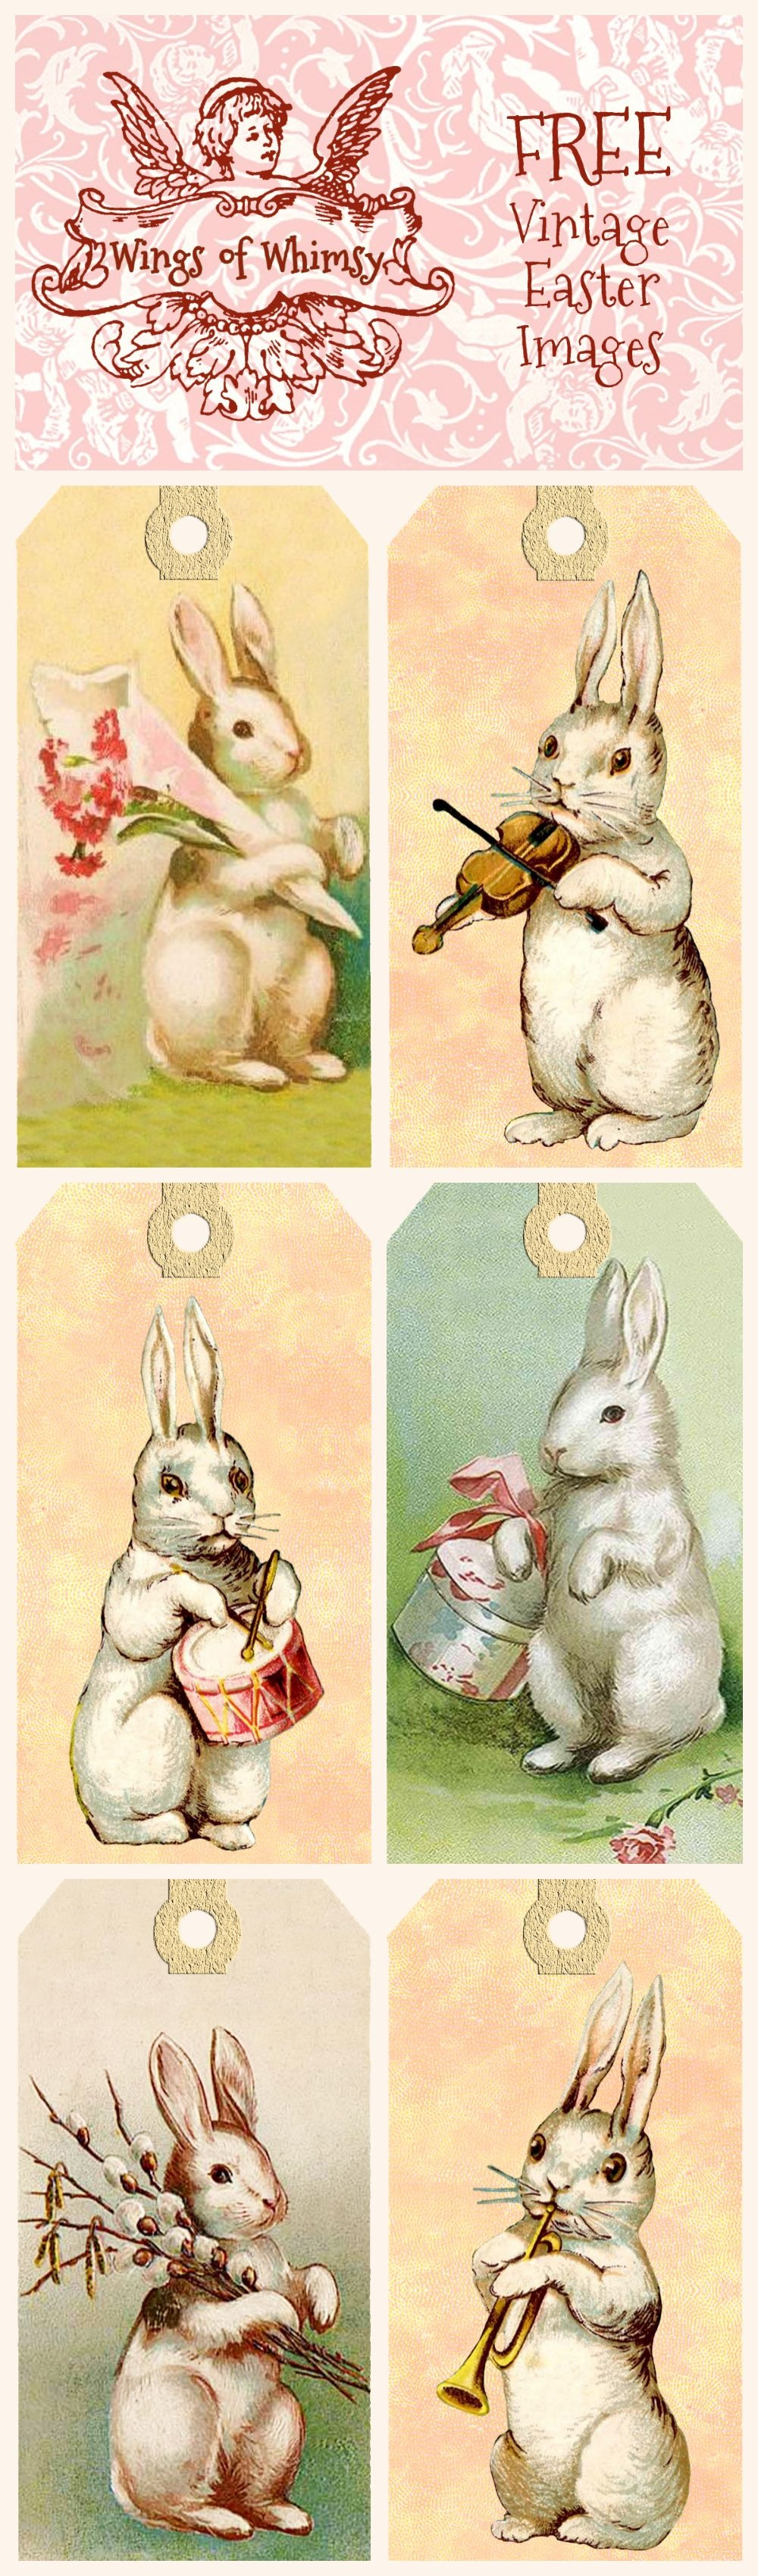 Vintage Easter Bunny Tags – Free Printables   Easter   Easter Crafts - Free Printable Vintage Easter Images